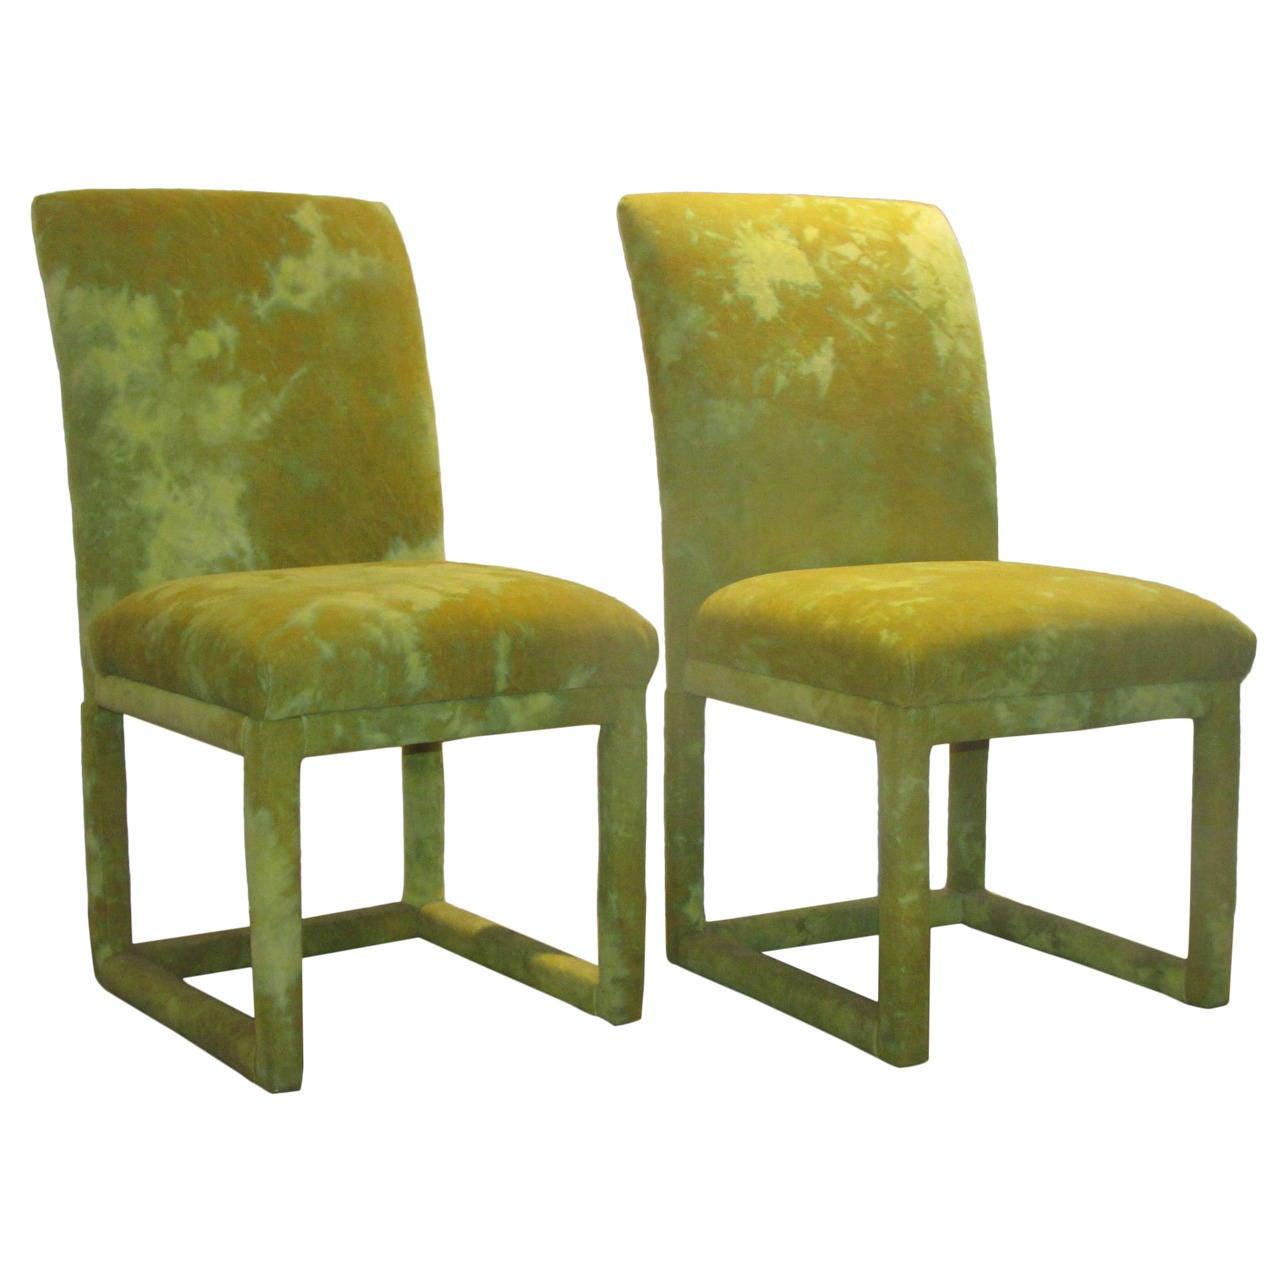 parsons chairs office chair and desk thayer coggins parson milo baughman jack lenor larsen for sale